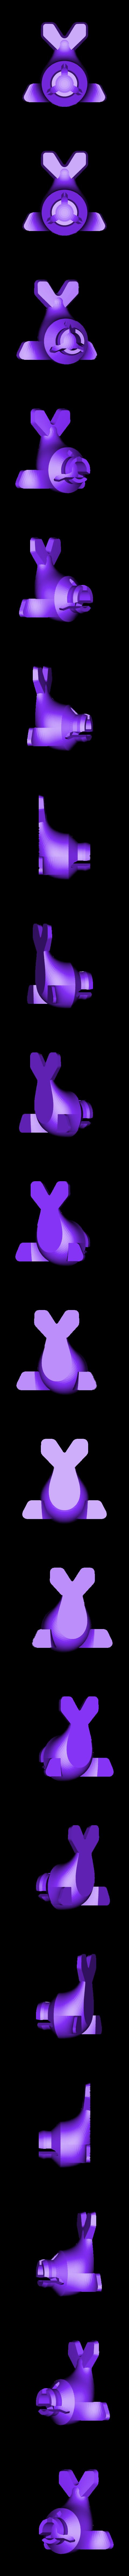 mtmk_trifix_sealbottom.stl Download free STL file Babyseal • 3D printable model, mageli